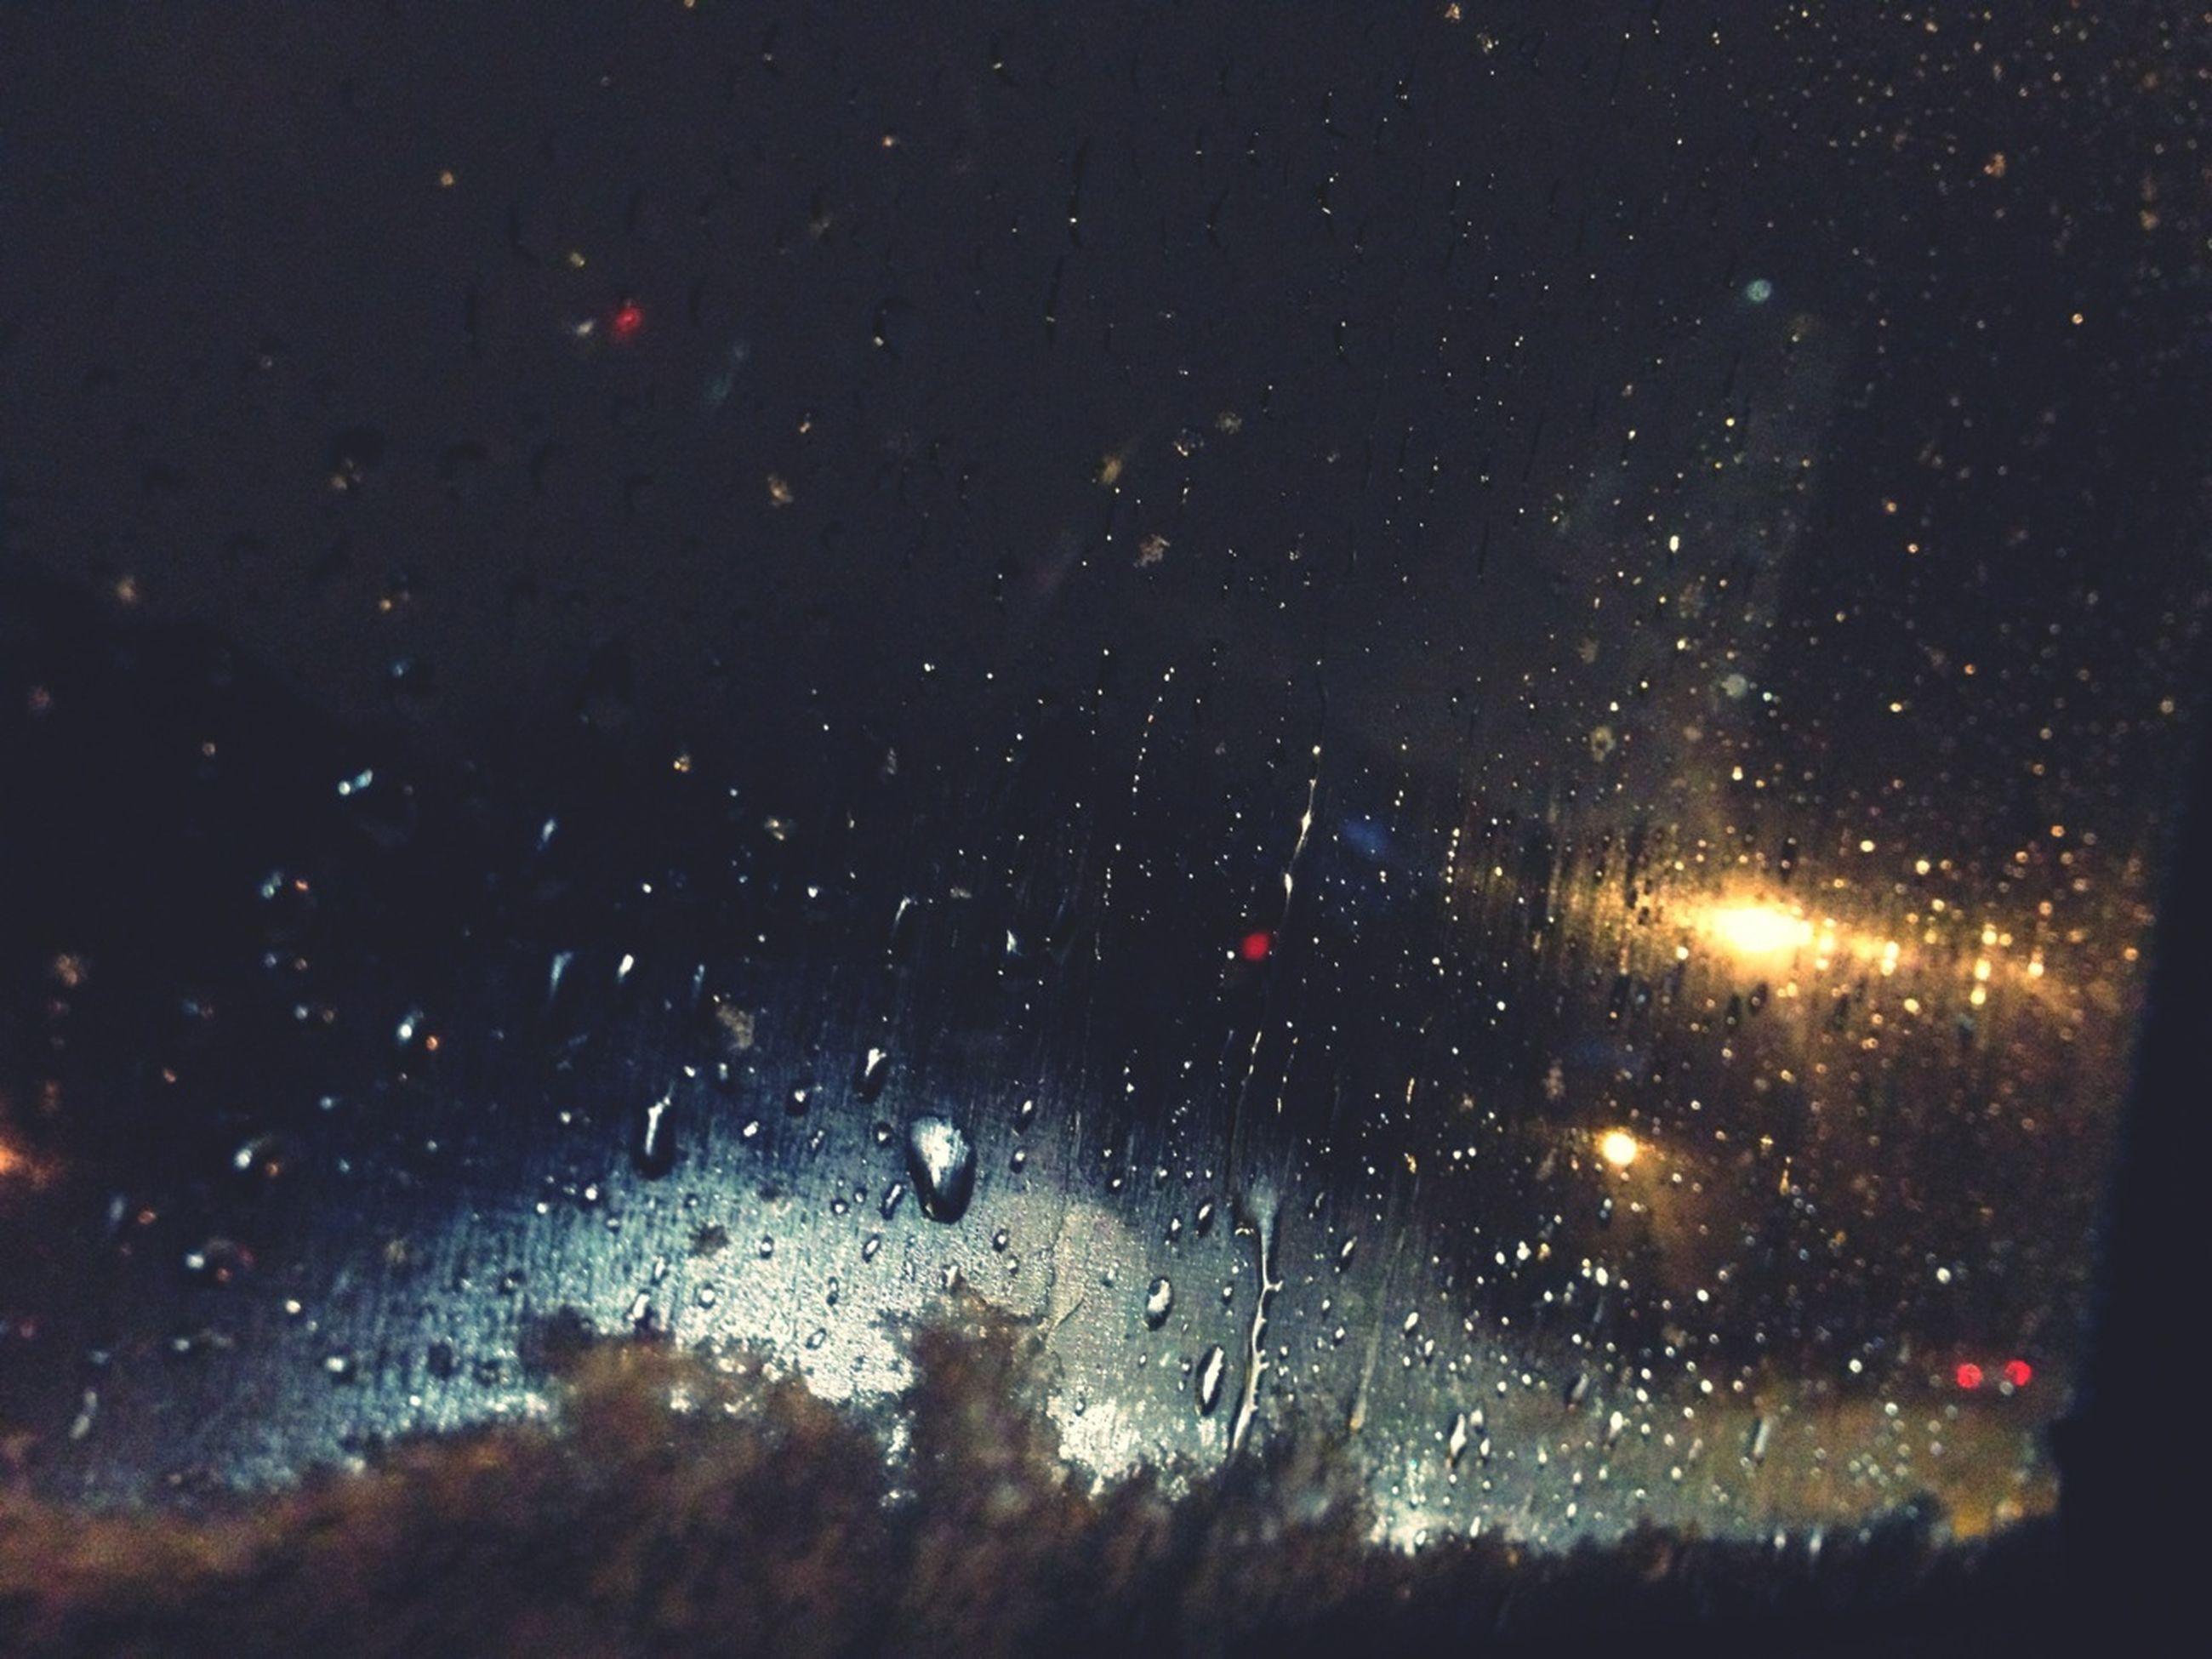 window, wet, night, drop, rain, transparent, glass - material, car, season, transportation, indoors, weather, land vehicle, windshield, vehicle interior, illuminated, raindrop, mode of transport, full frame, water